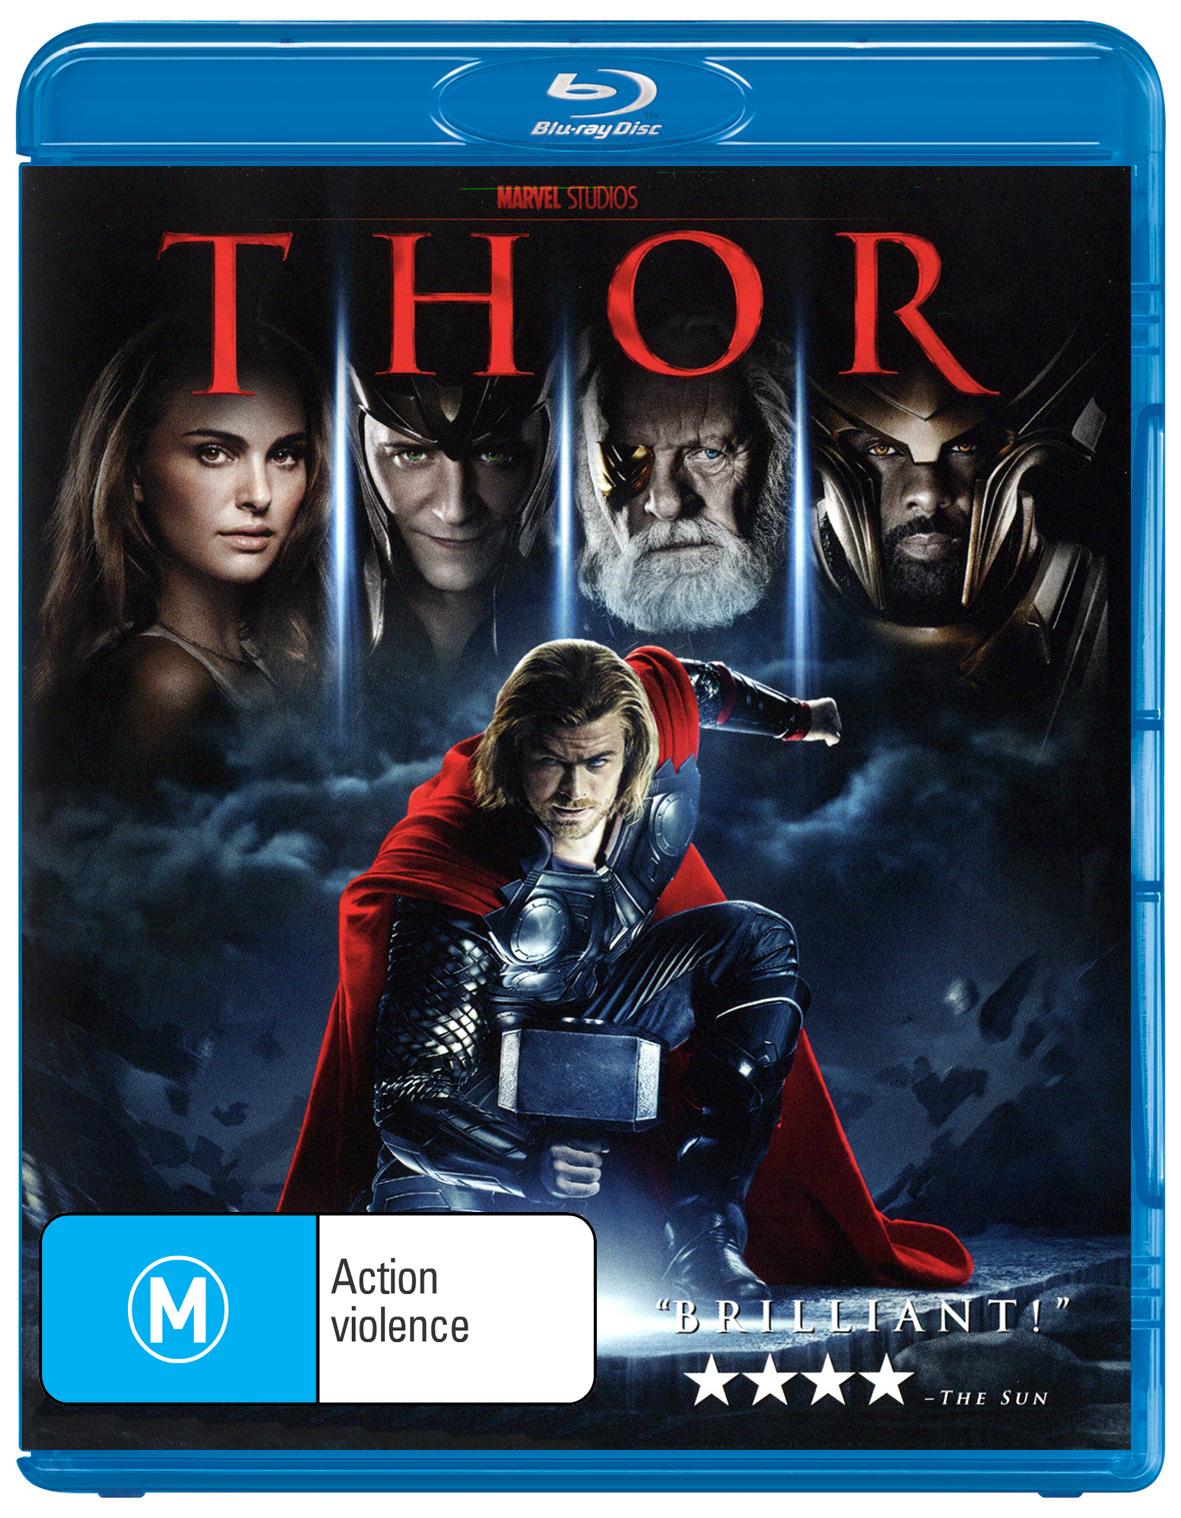 Thor on Blu-ray image